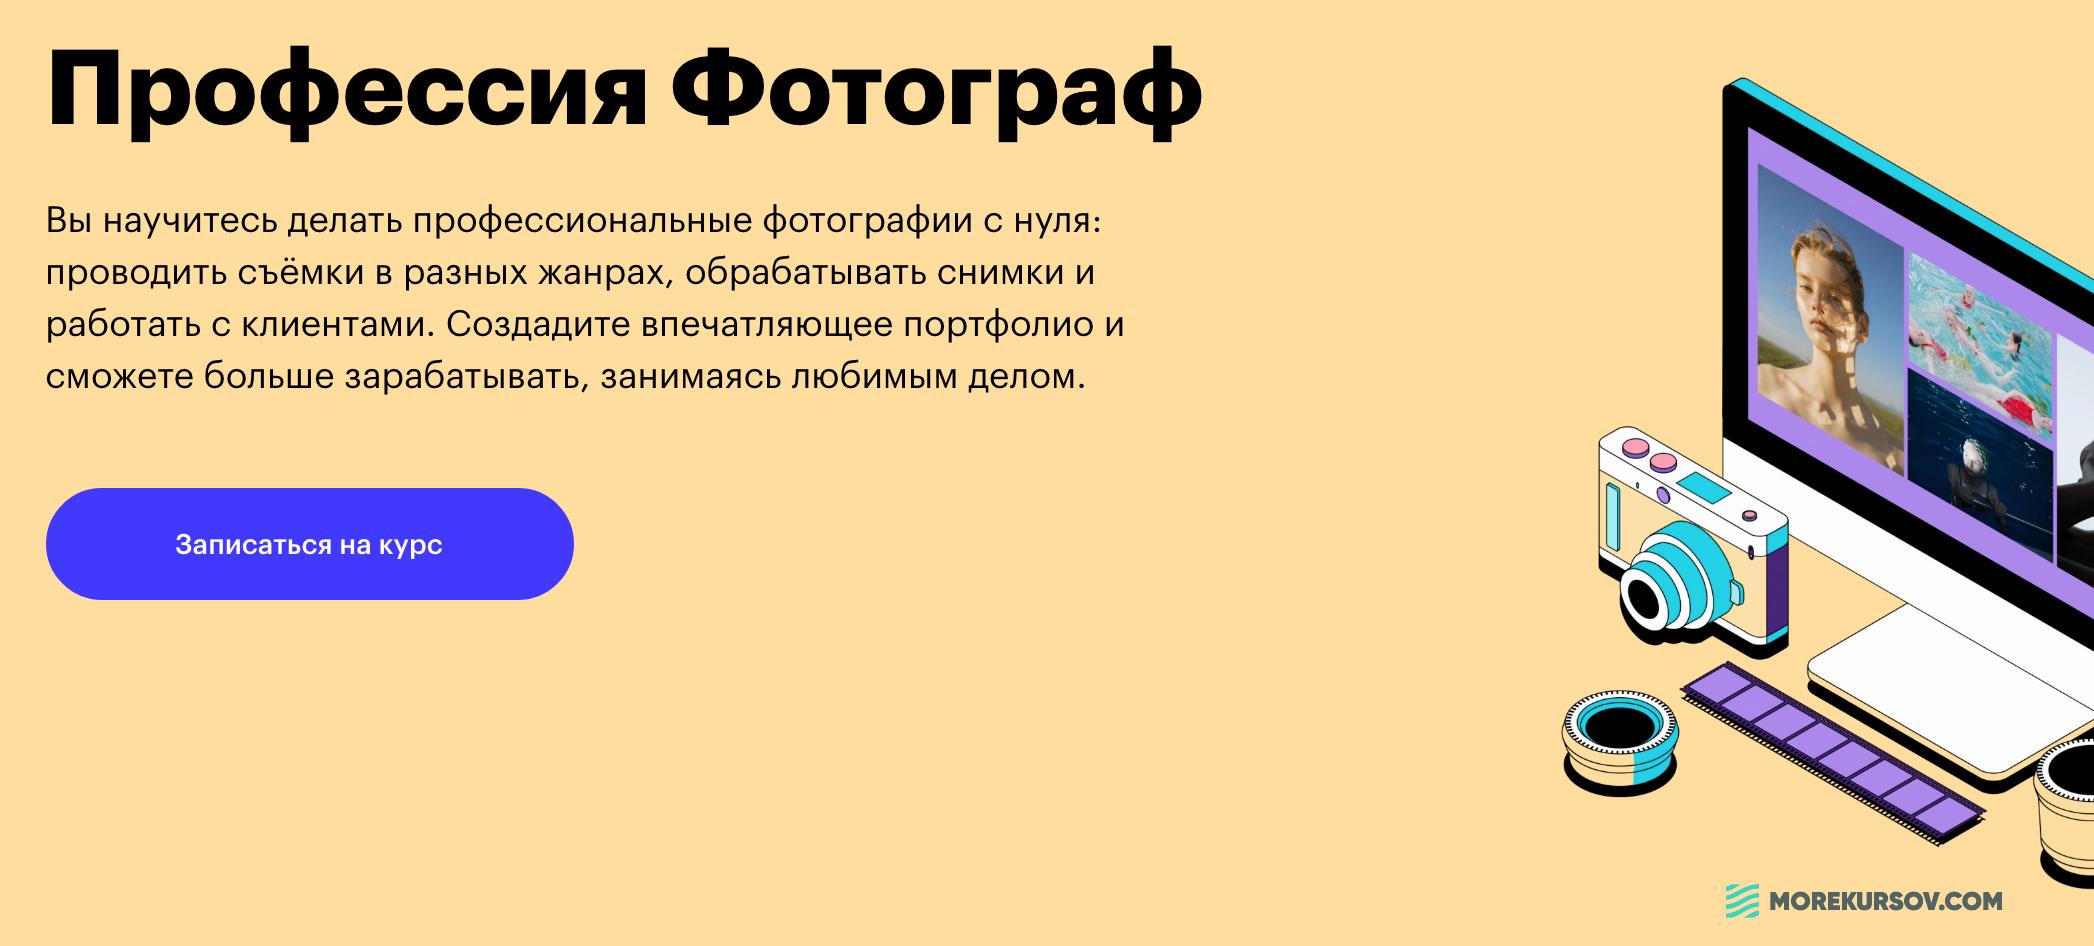 snimok-ehkrana-2020-09-13-v-11-25-05-png.9626